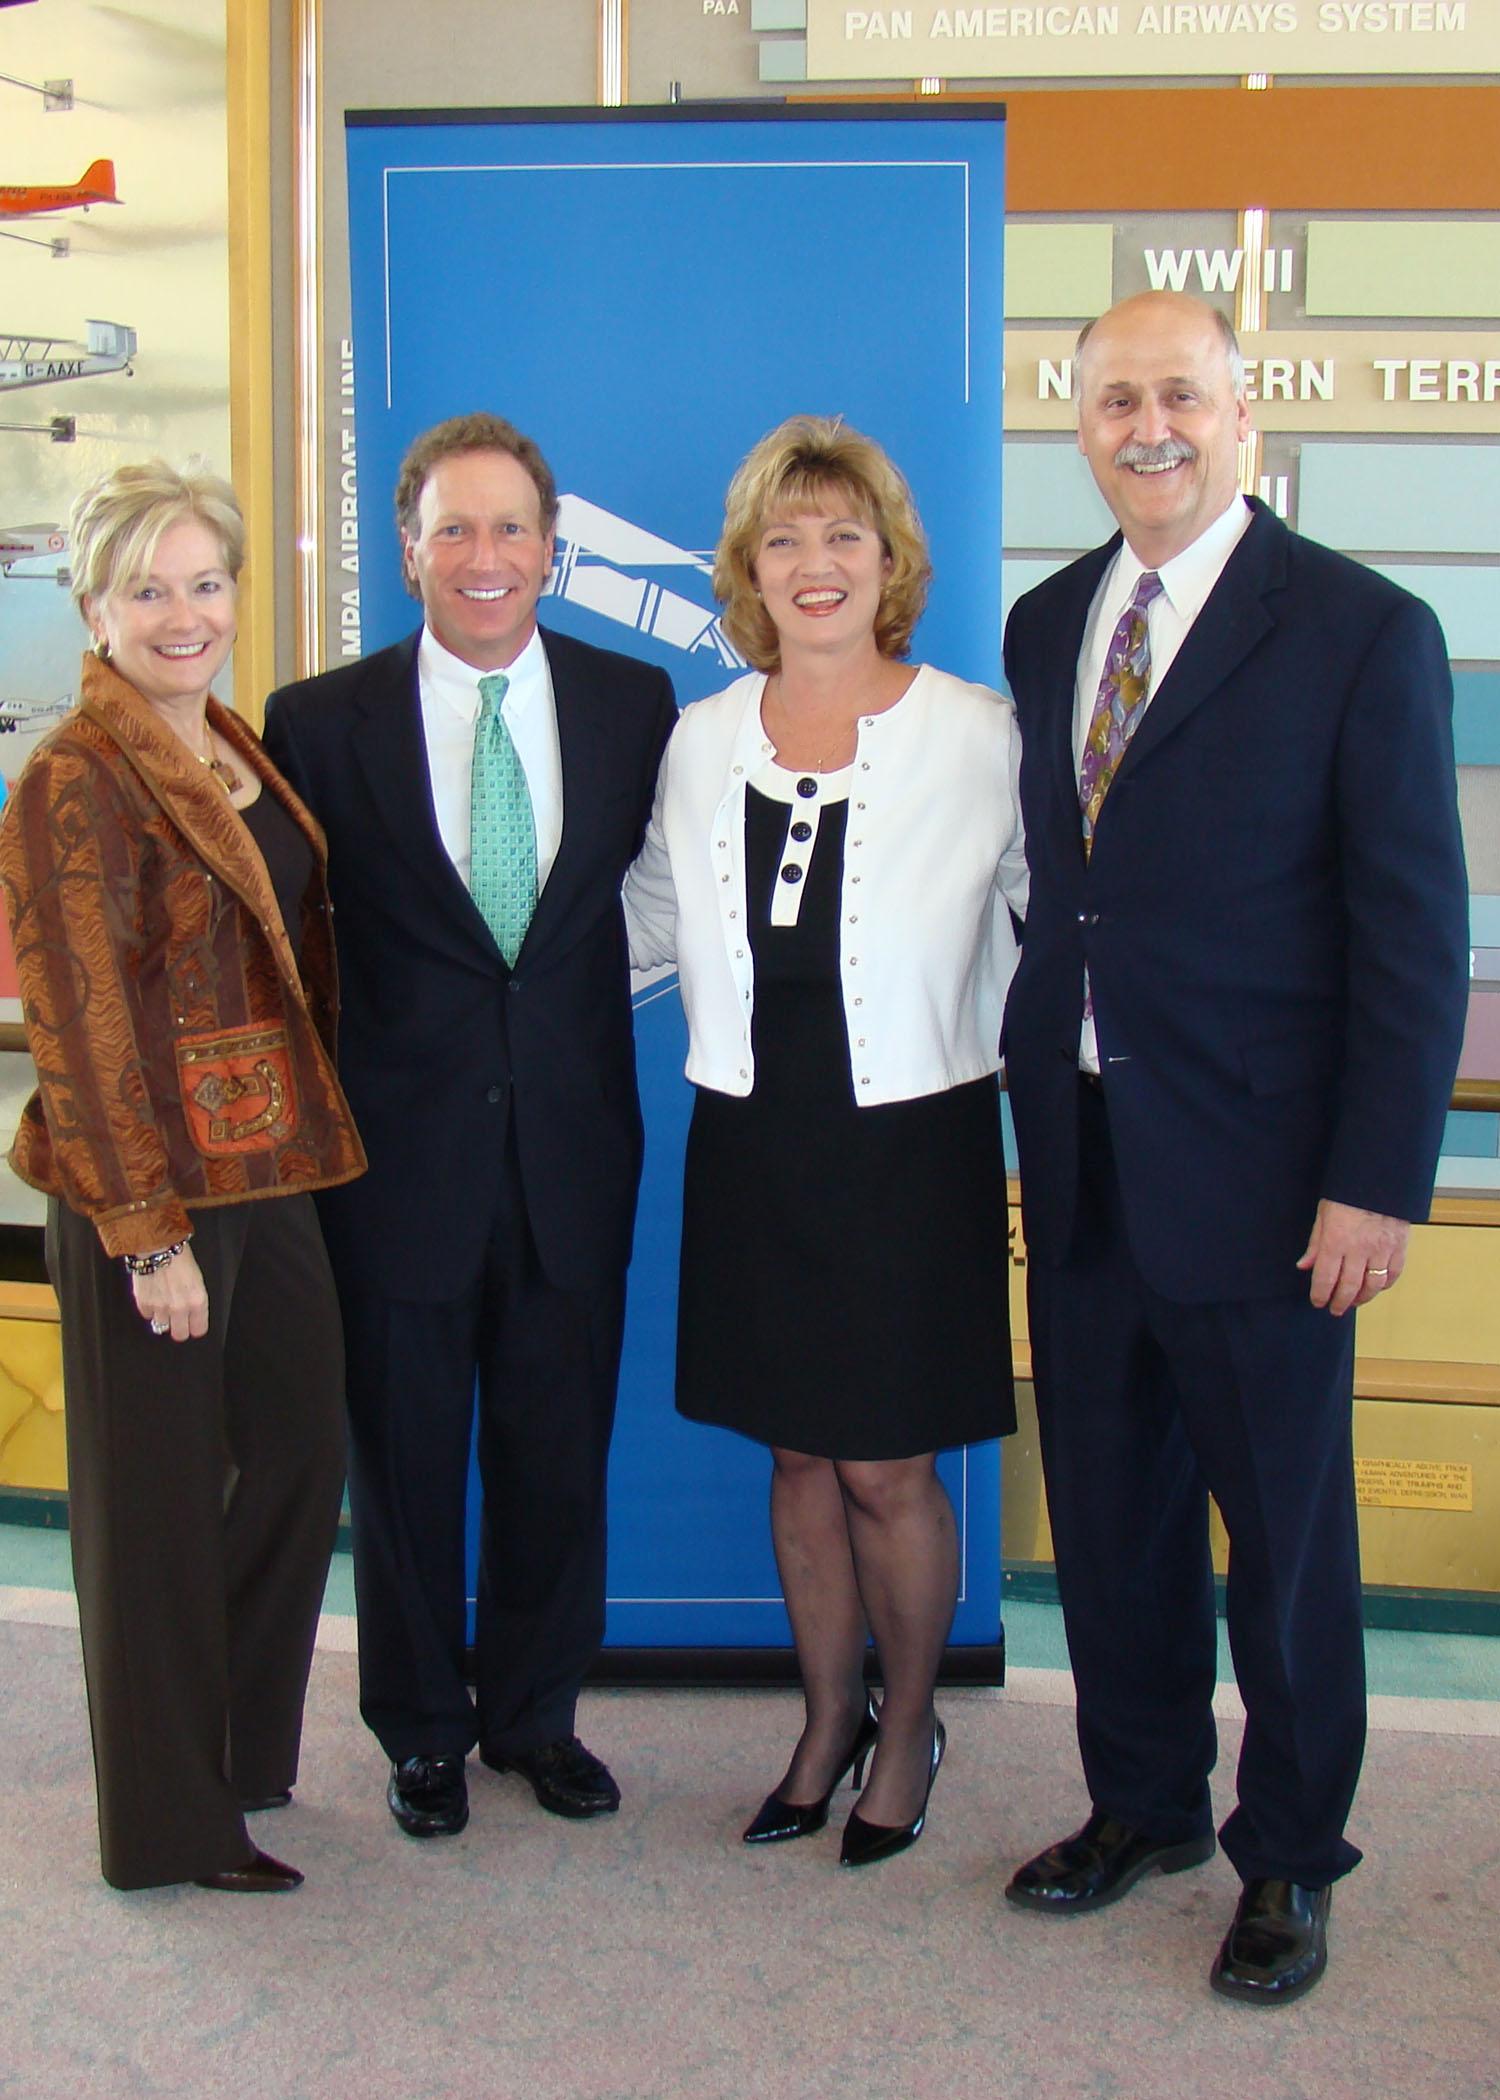 Bonnie Reitz, David Hilfman, Colleen Picard & Rich Lisser @ SPMOH - 1, 27 Mar '08.jpg